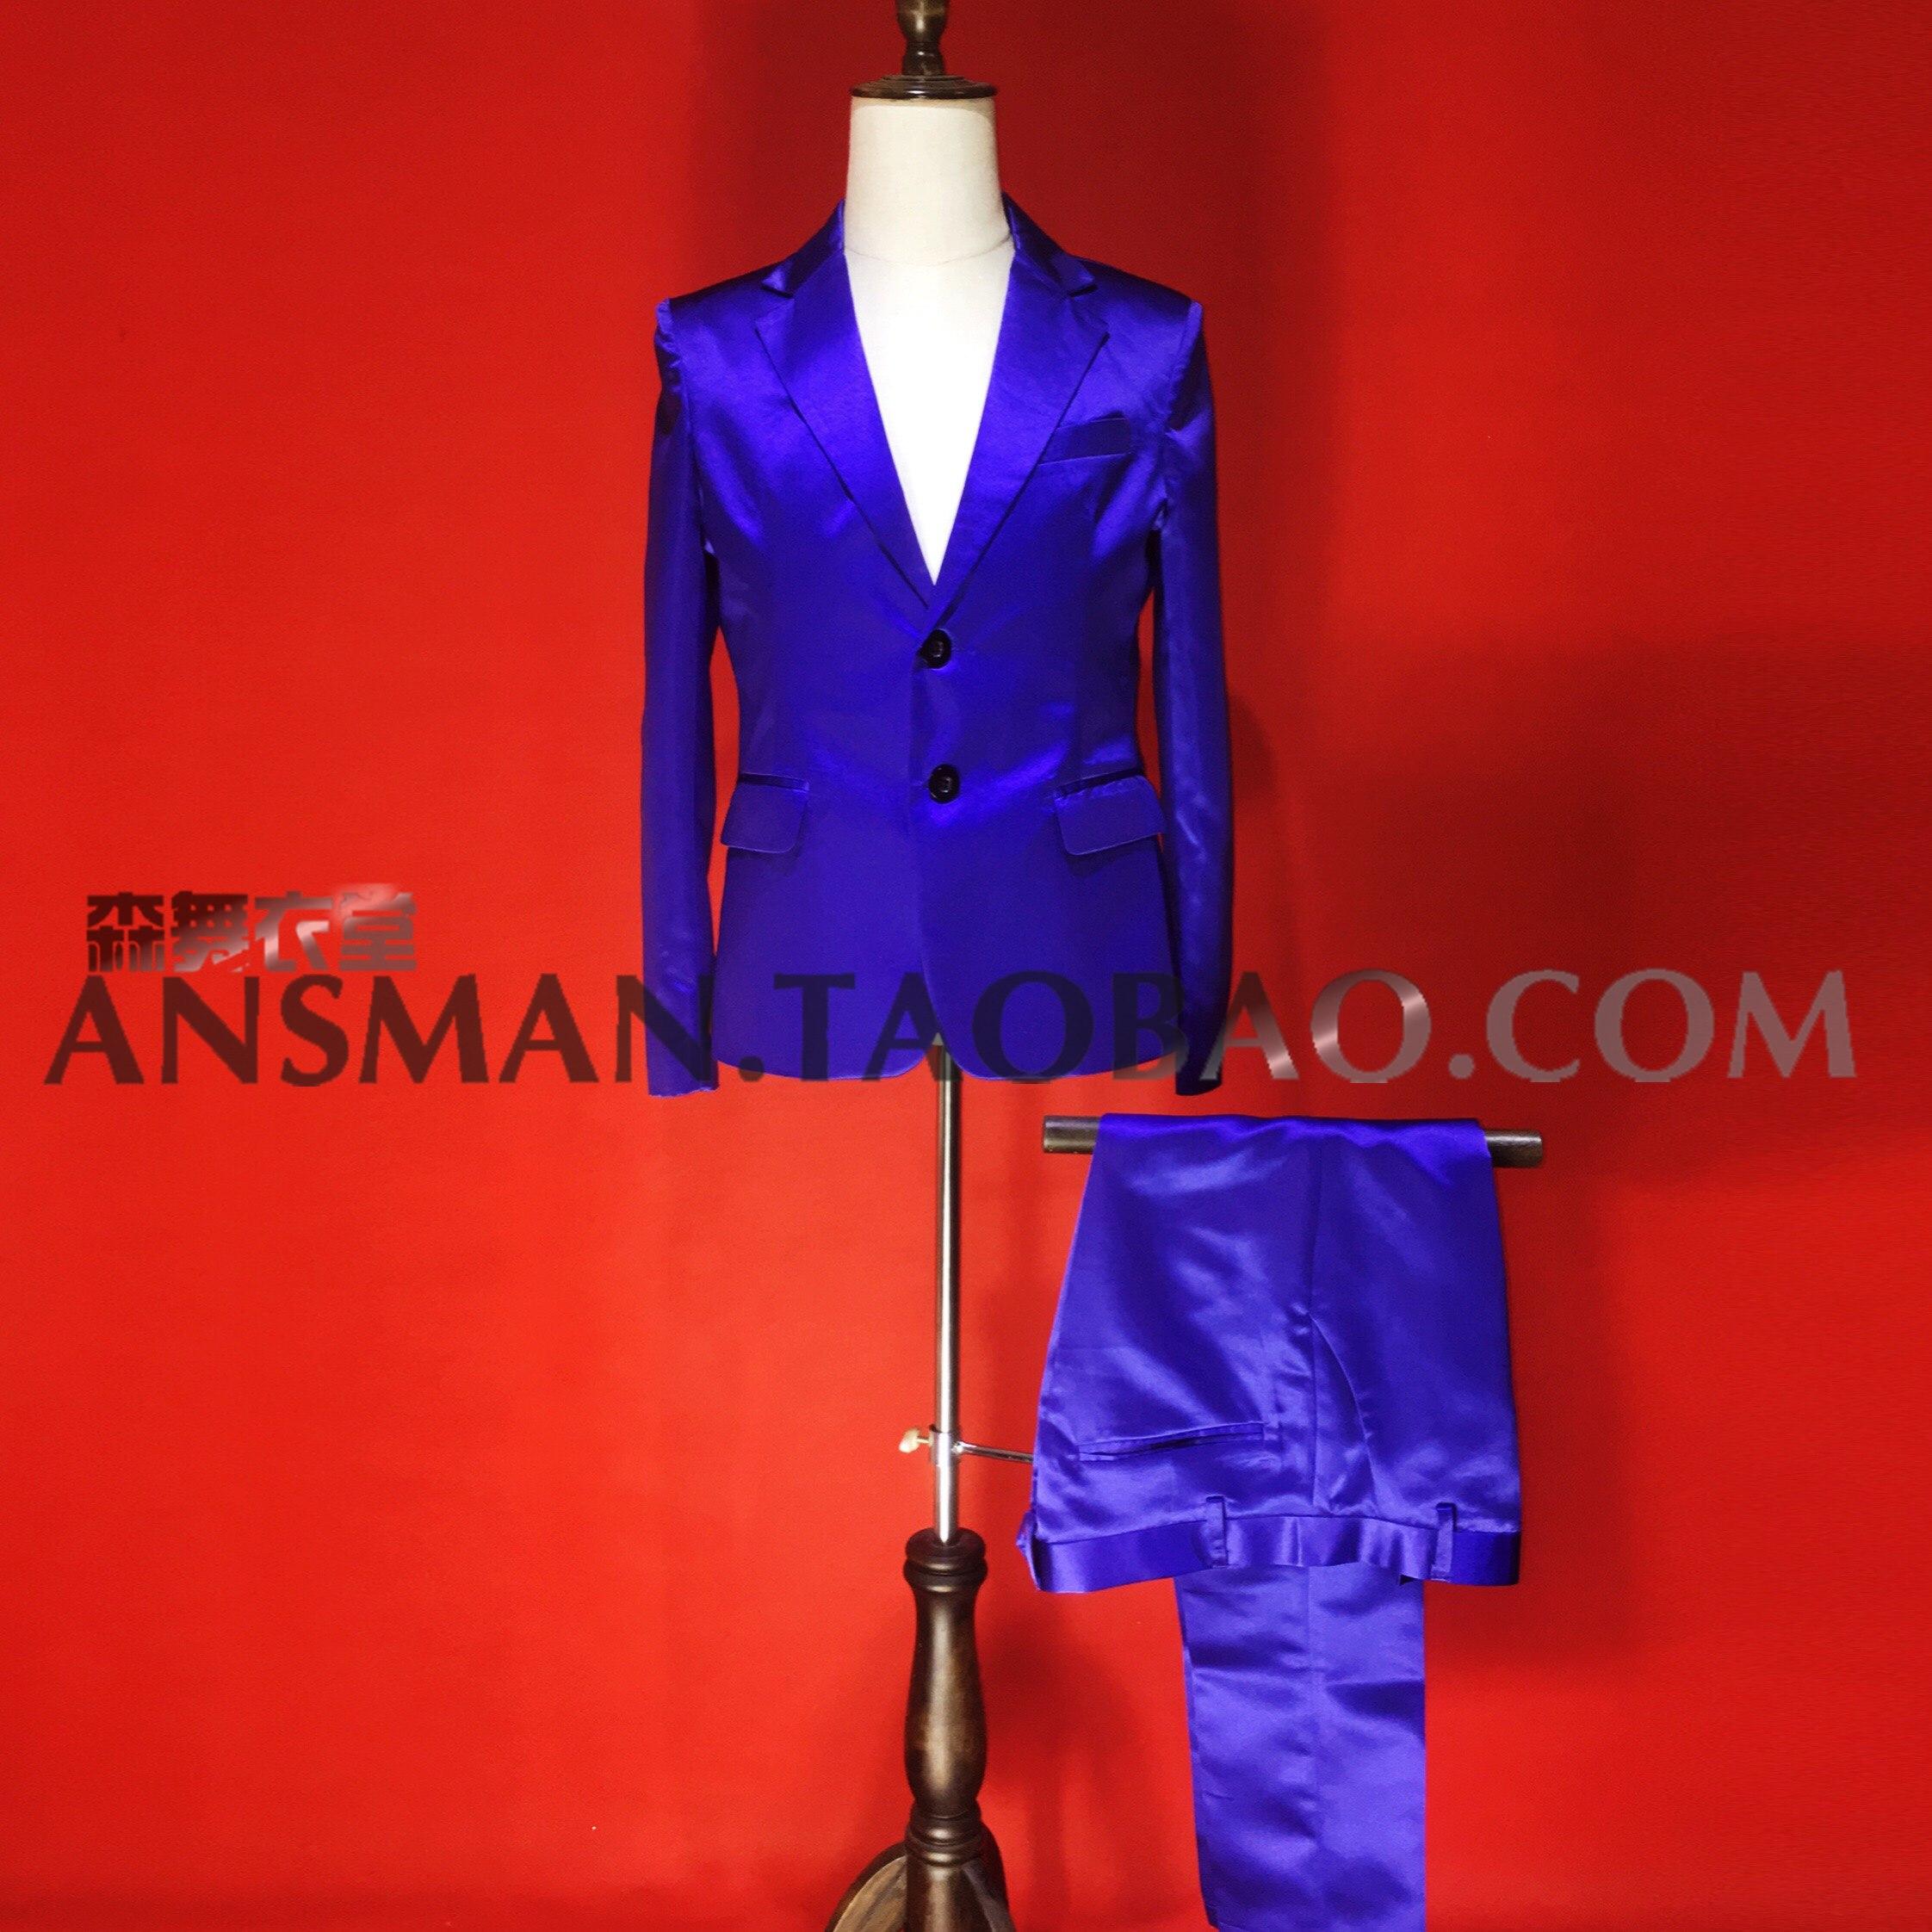 Hot New Blue purple Blazer Men Wedding Suit Jacket Slim Fit Stylish Costumes Stage male satin Singer Blazers suits S 4XL